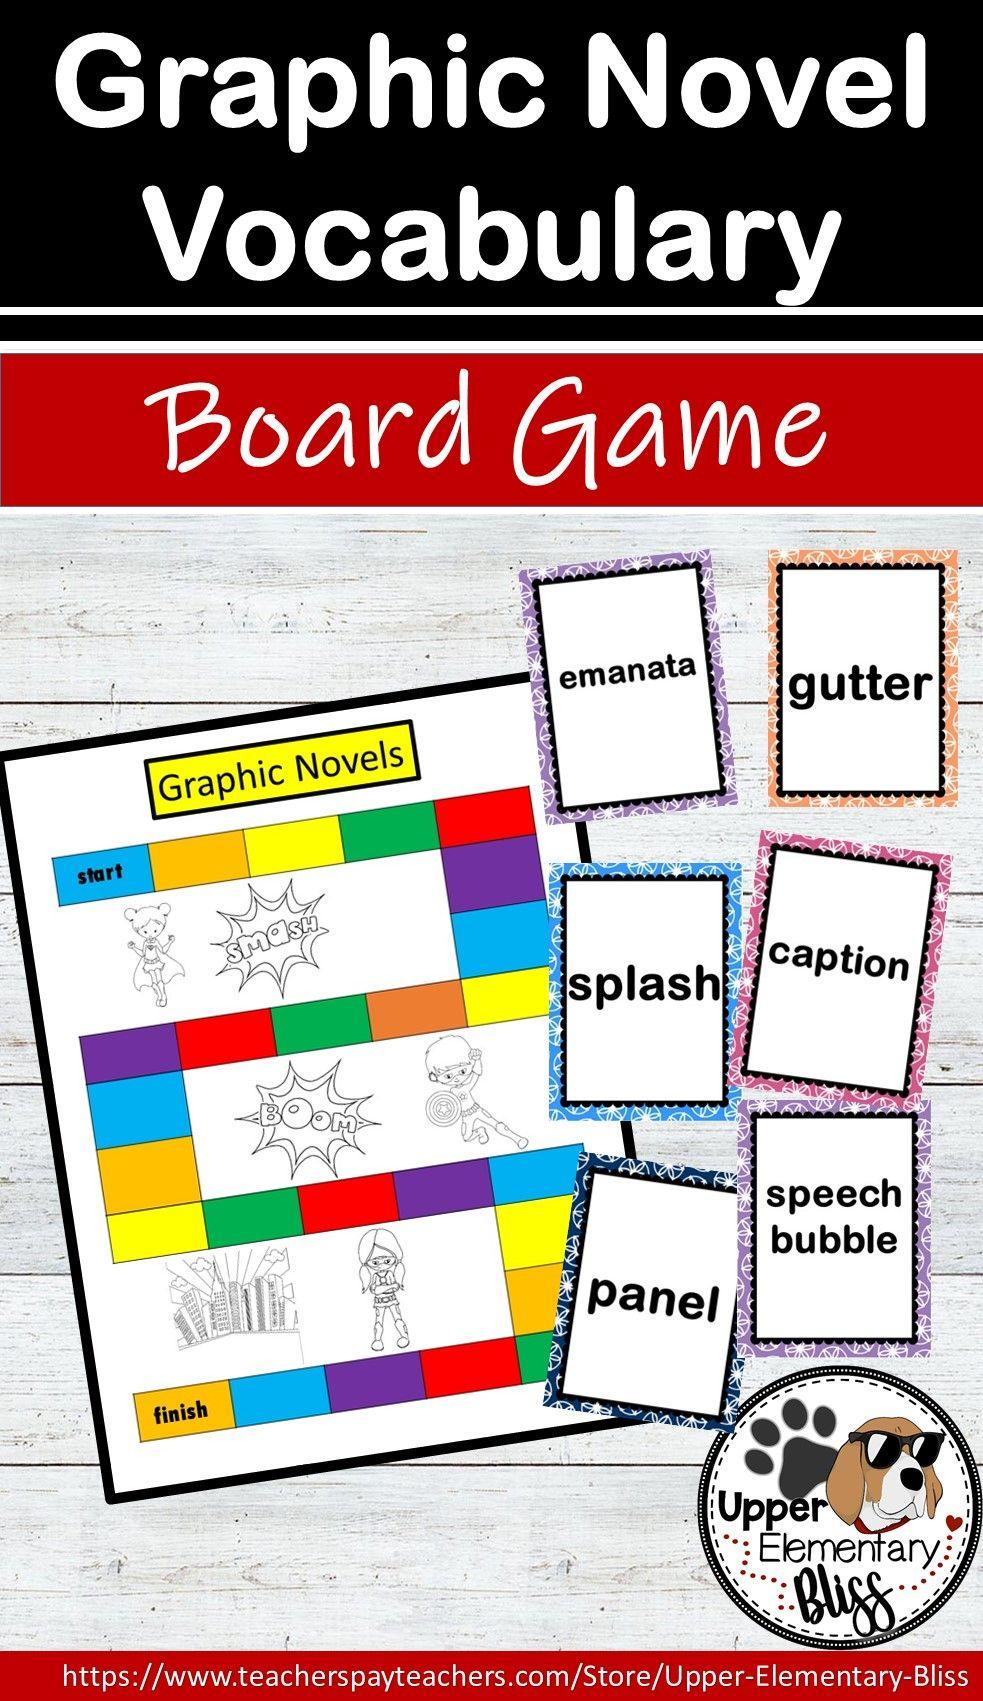 Graphic Novel Vocabulary Board Game Vocabulary Vocabulary Activities Teaching Elementary [ 1701 x 983 Pixel ]